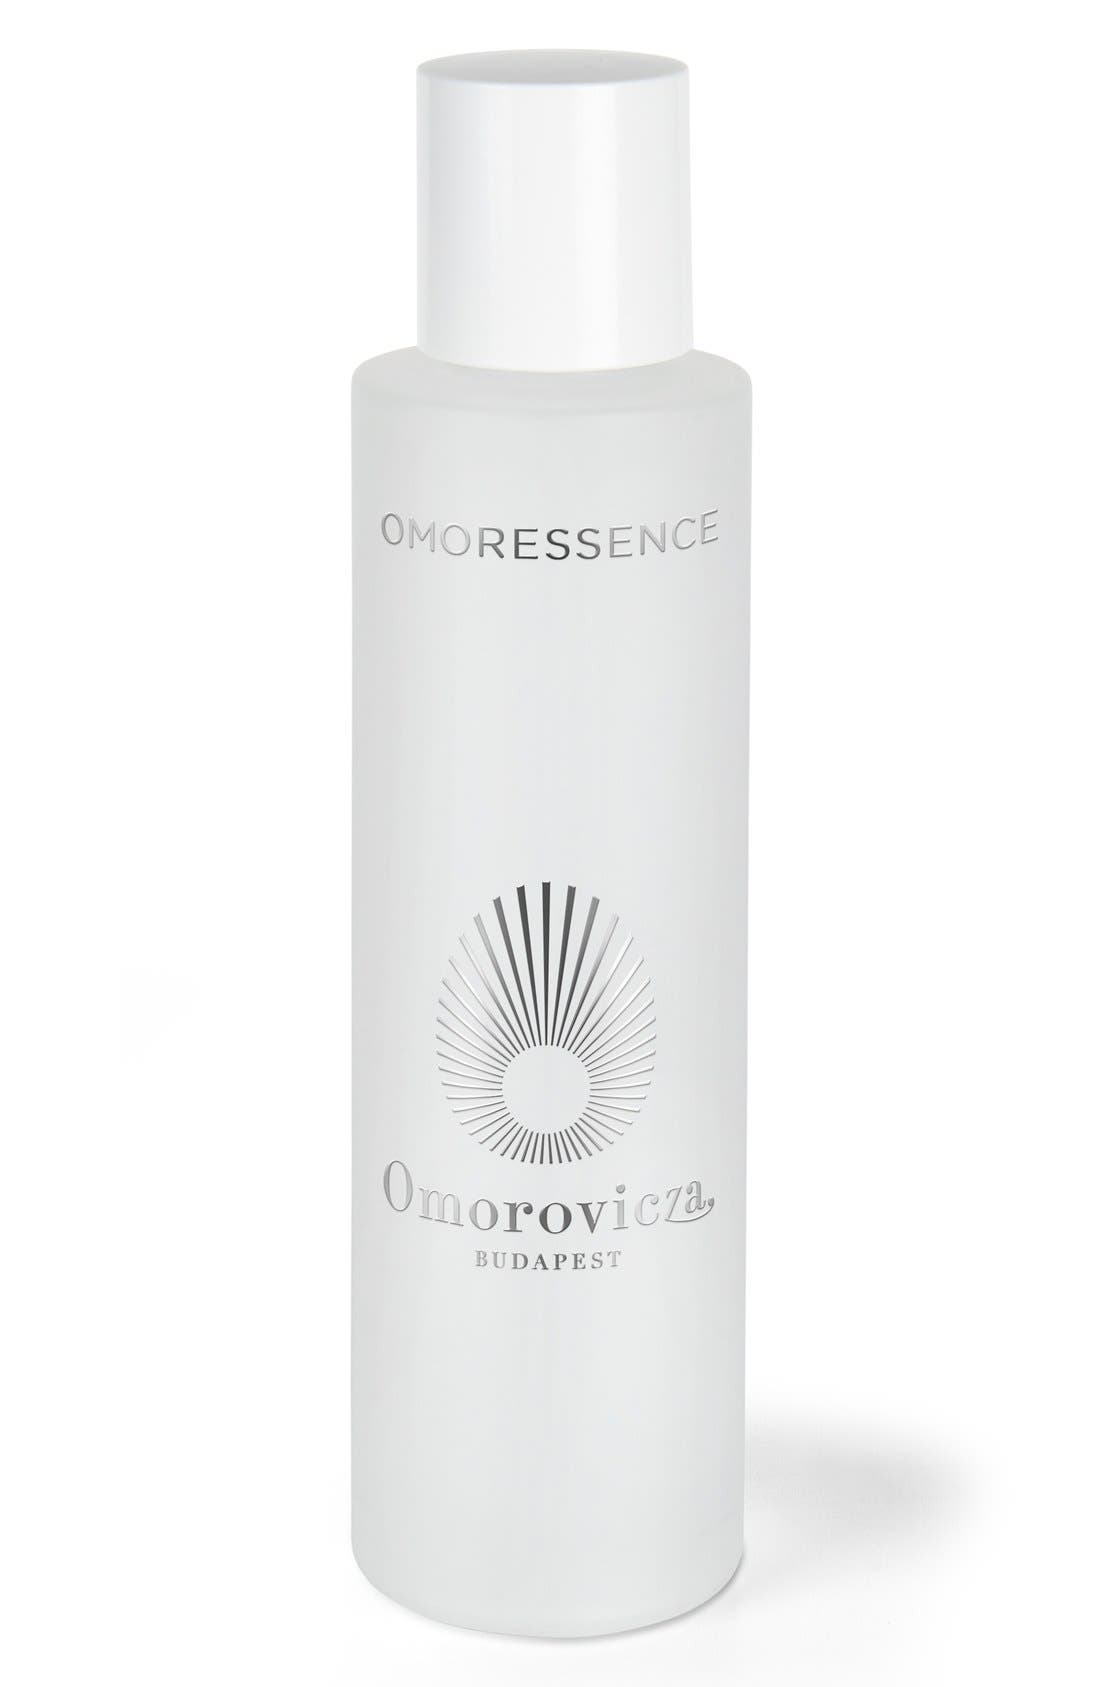 Omorovicza Omoressence Balancing & Hydrating Essence